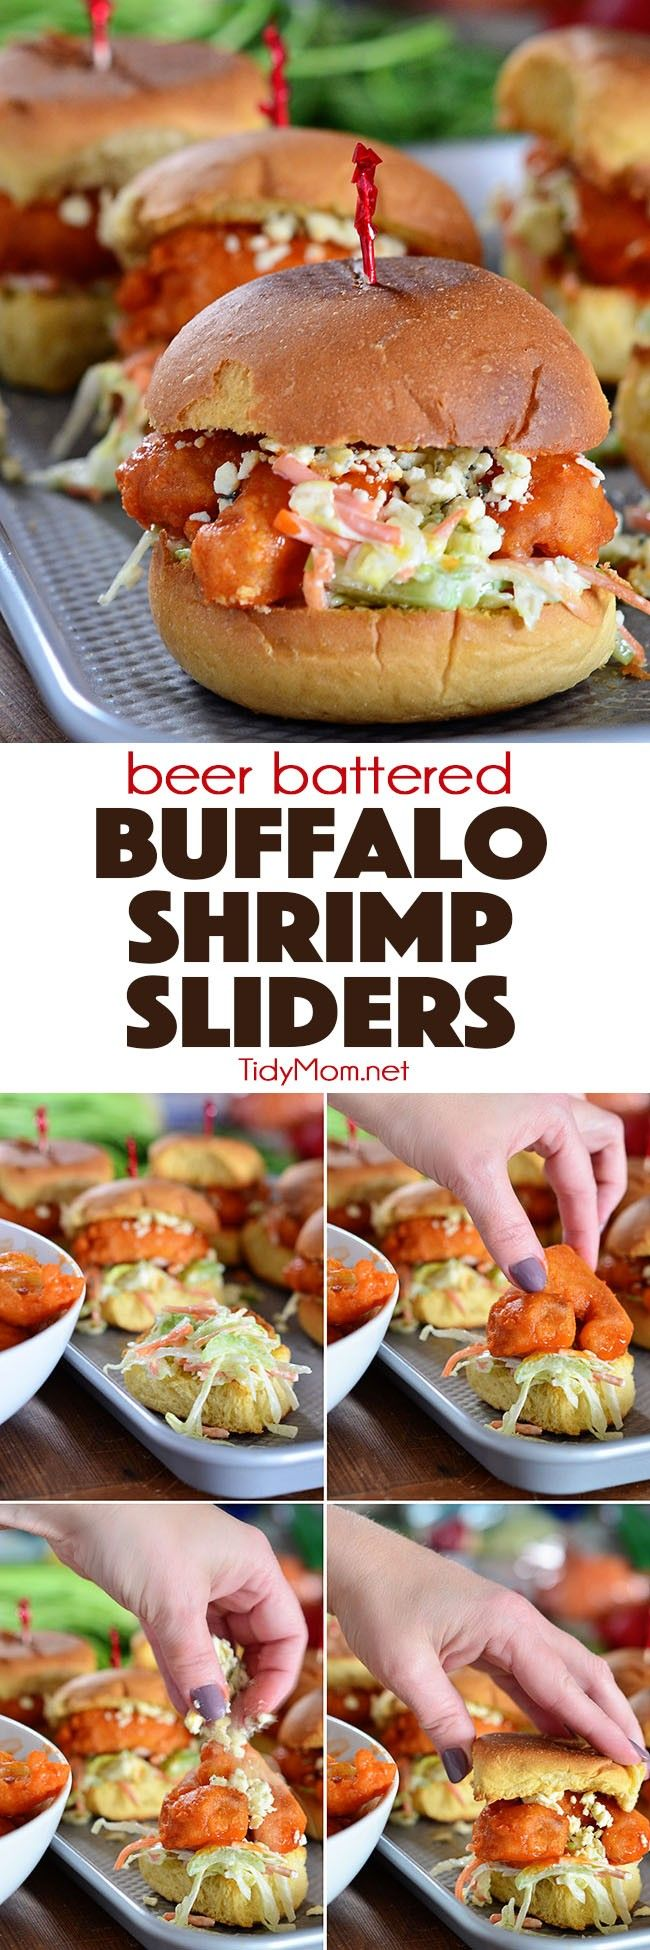 Beer Battered Buffalo Shrimp Sliders | TidyMom